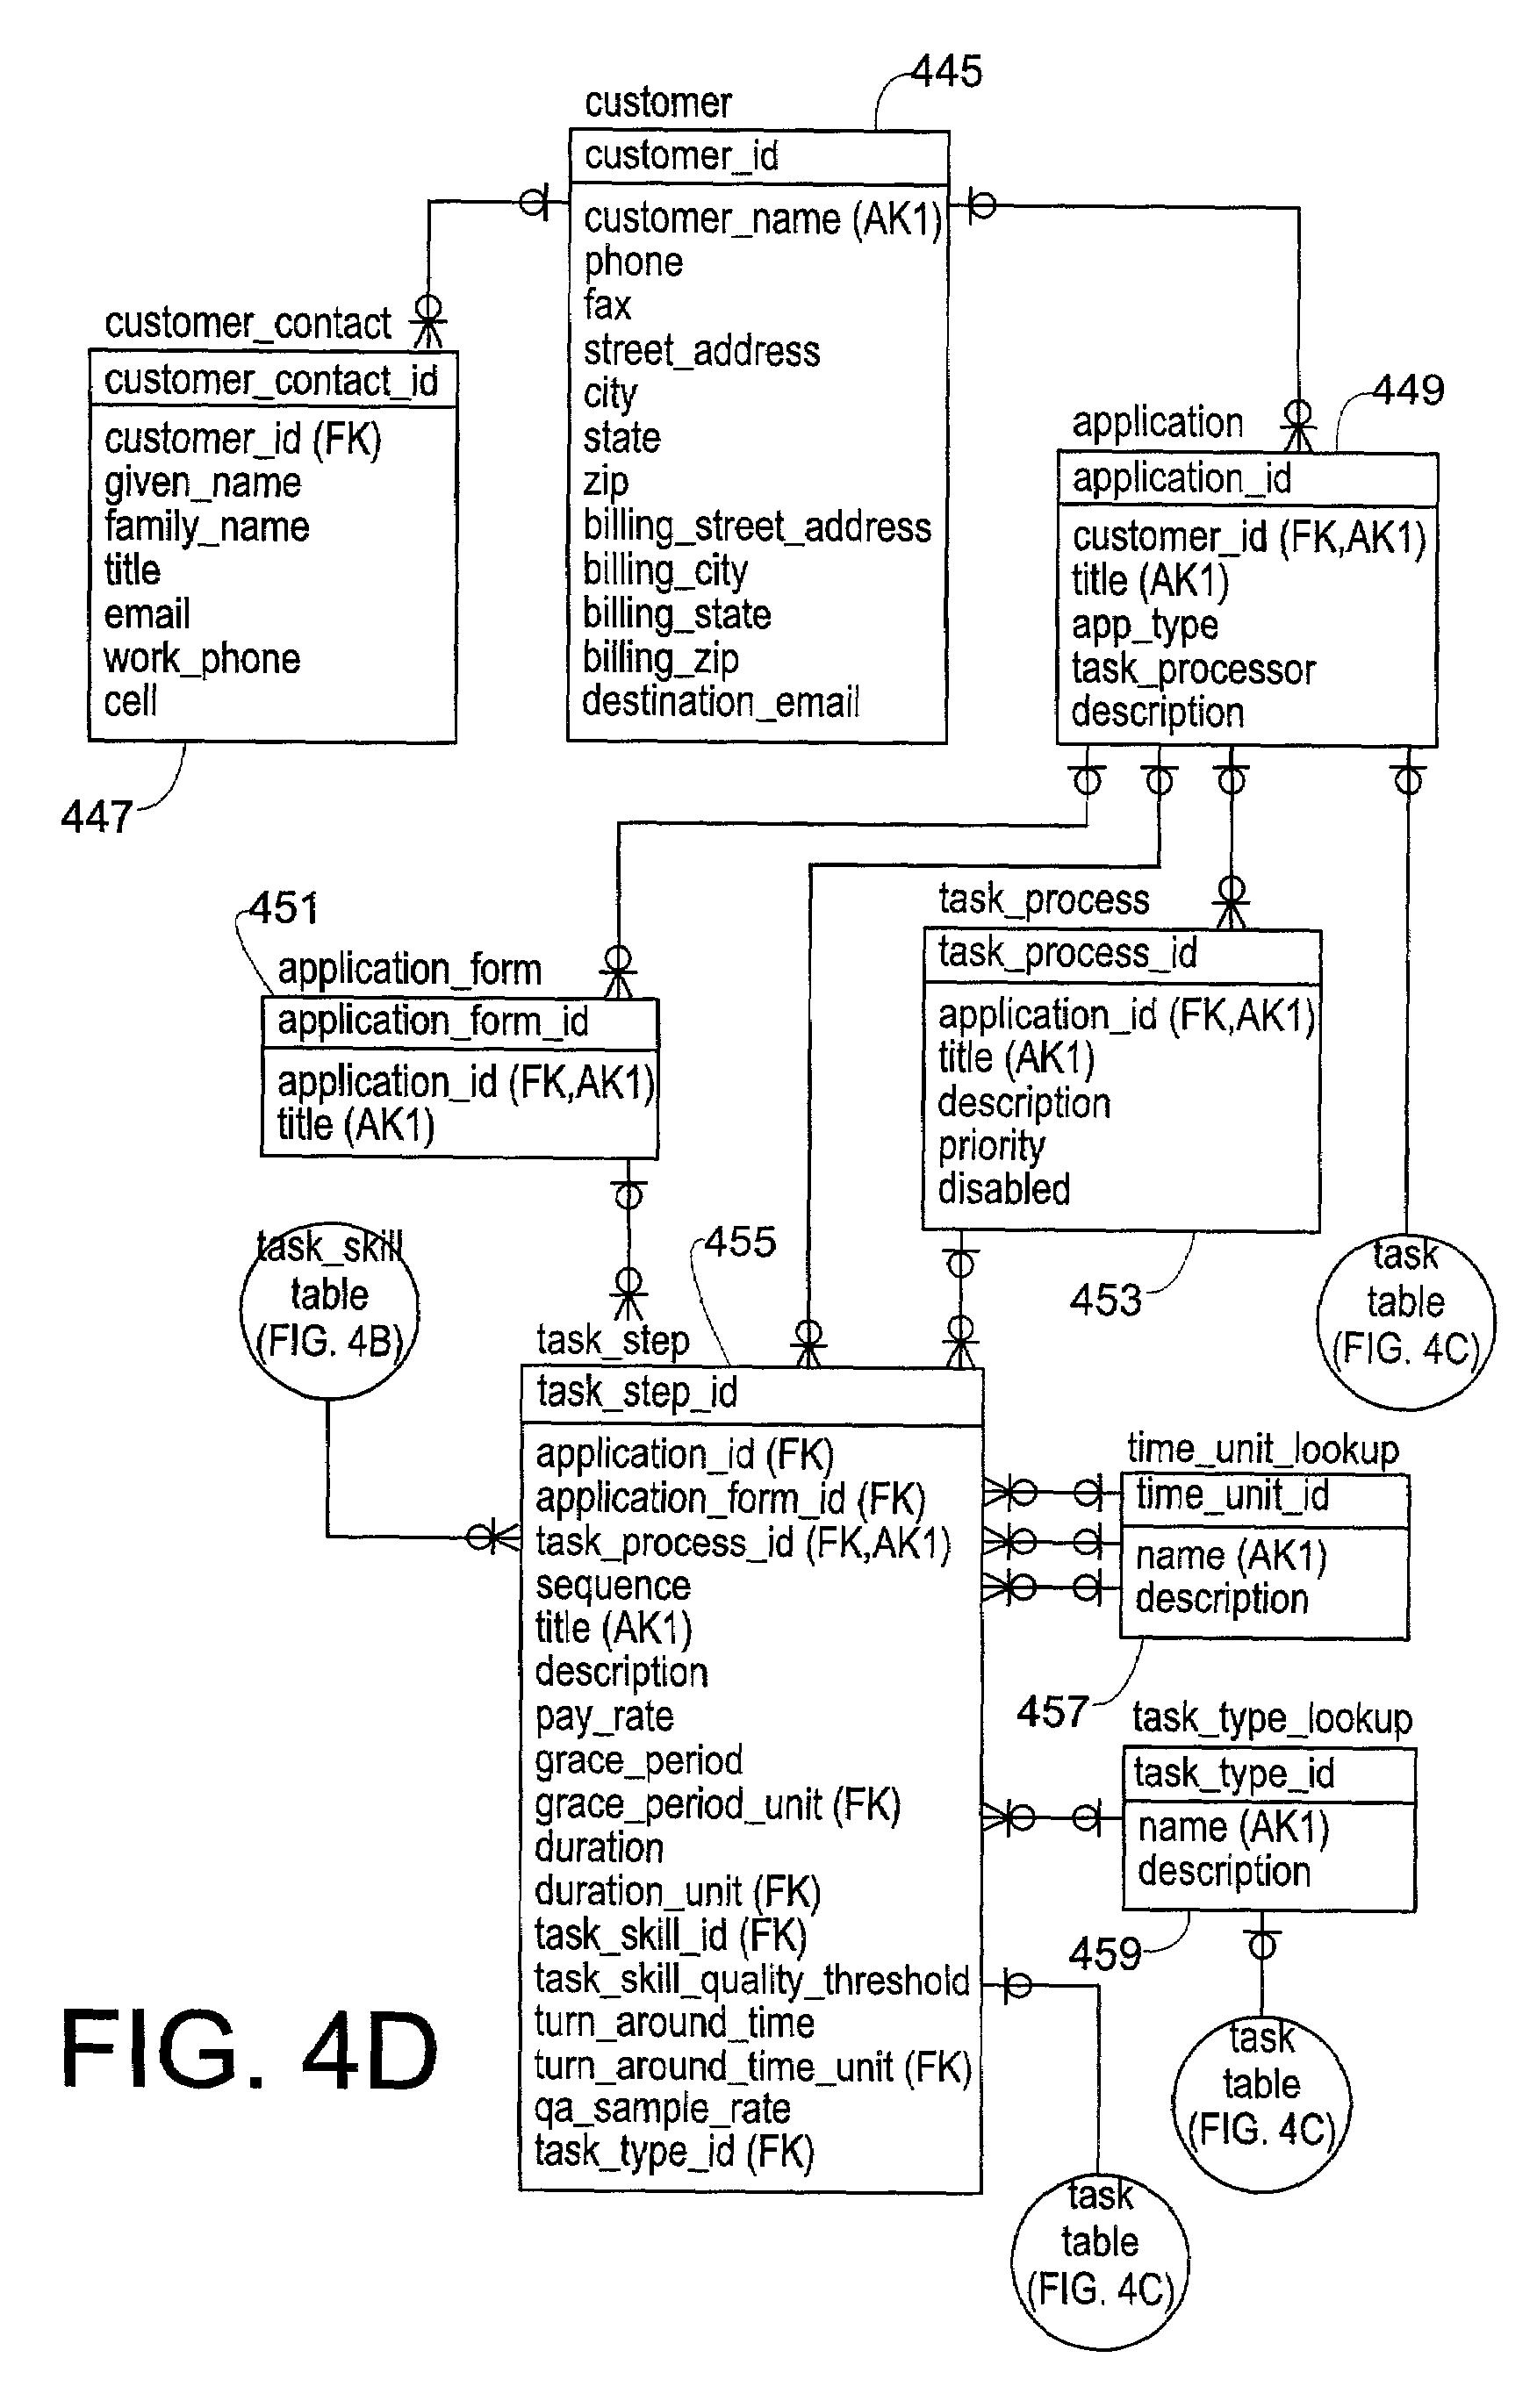 Er Diagram For Payroll System Patent Universal Task Management System Method And